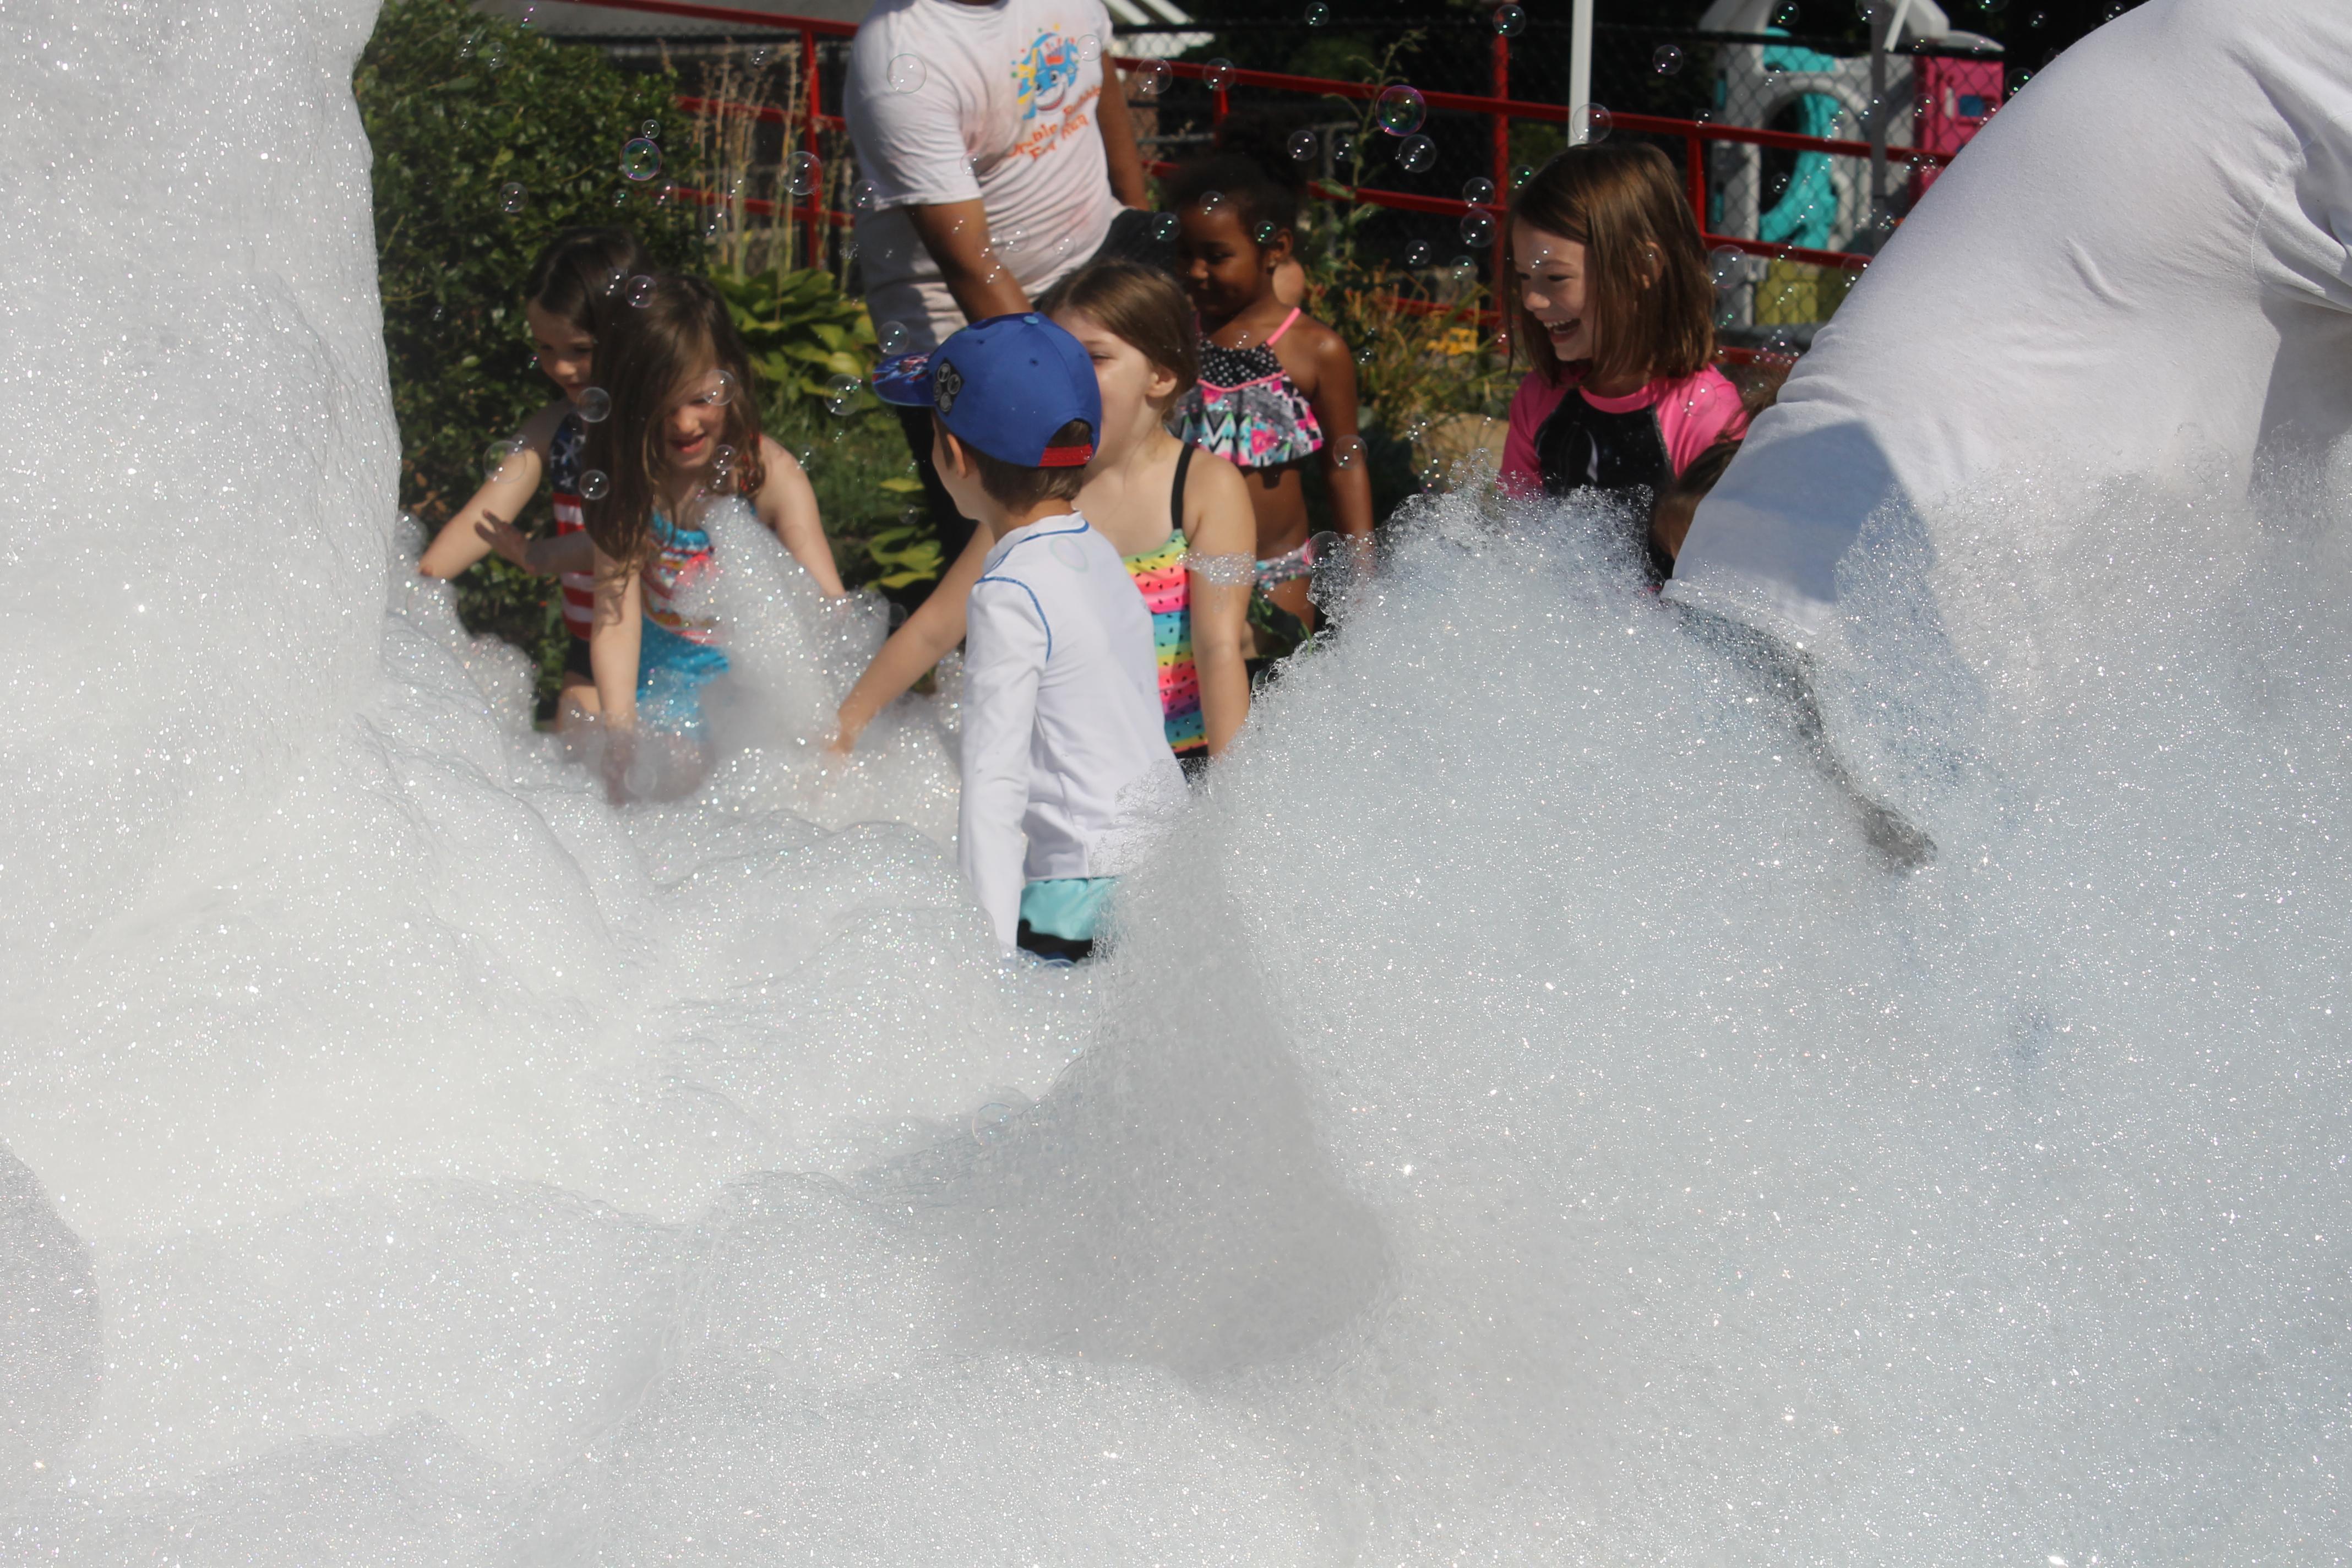 2019 Summer Camp Foam Party